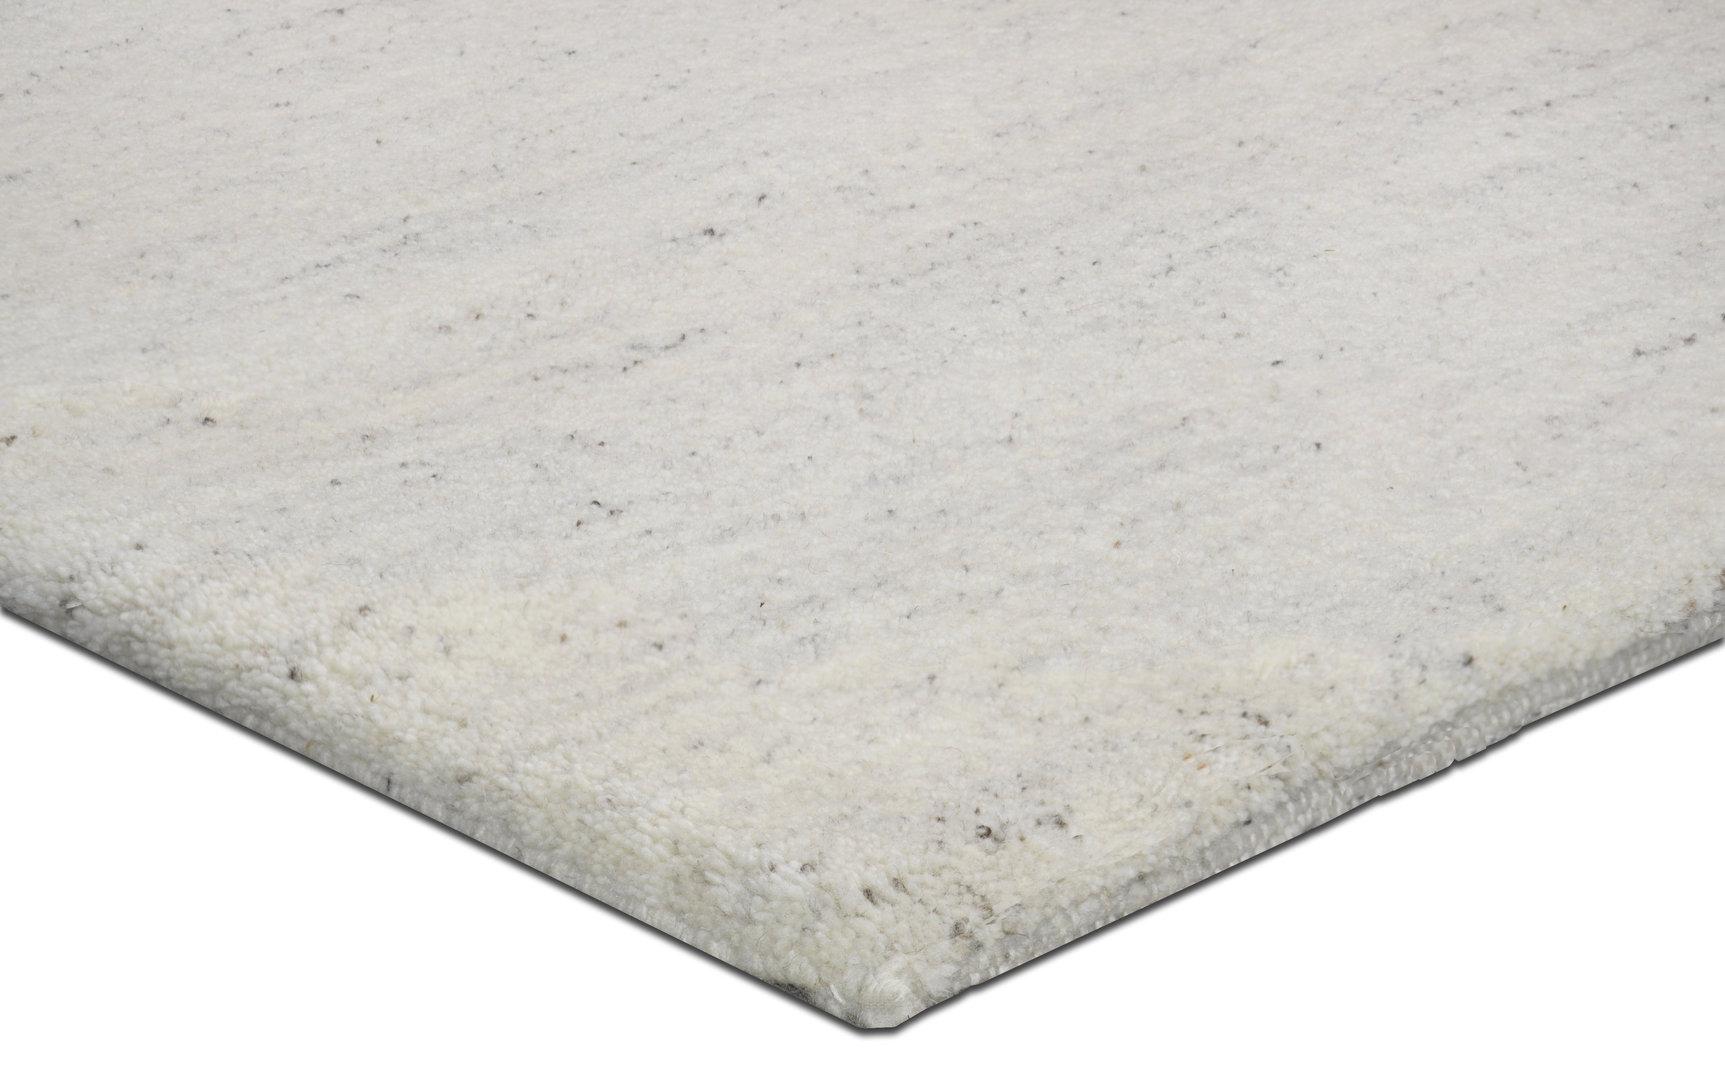 Berber teppich muster  Berberteppich Imaba Super Triple Qualität Uni sand preiswert